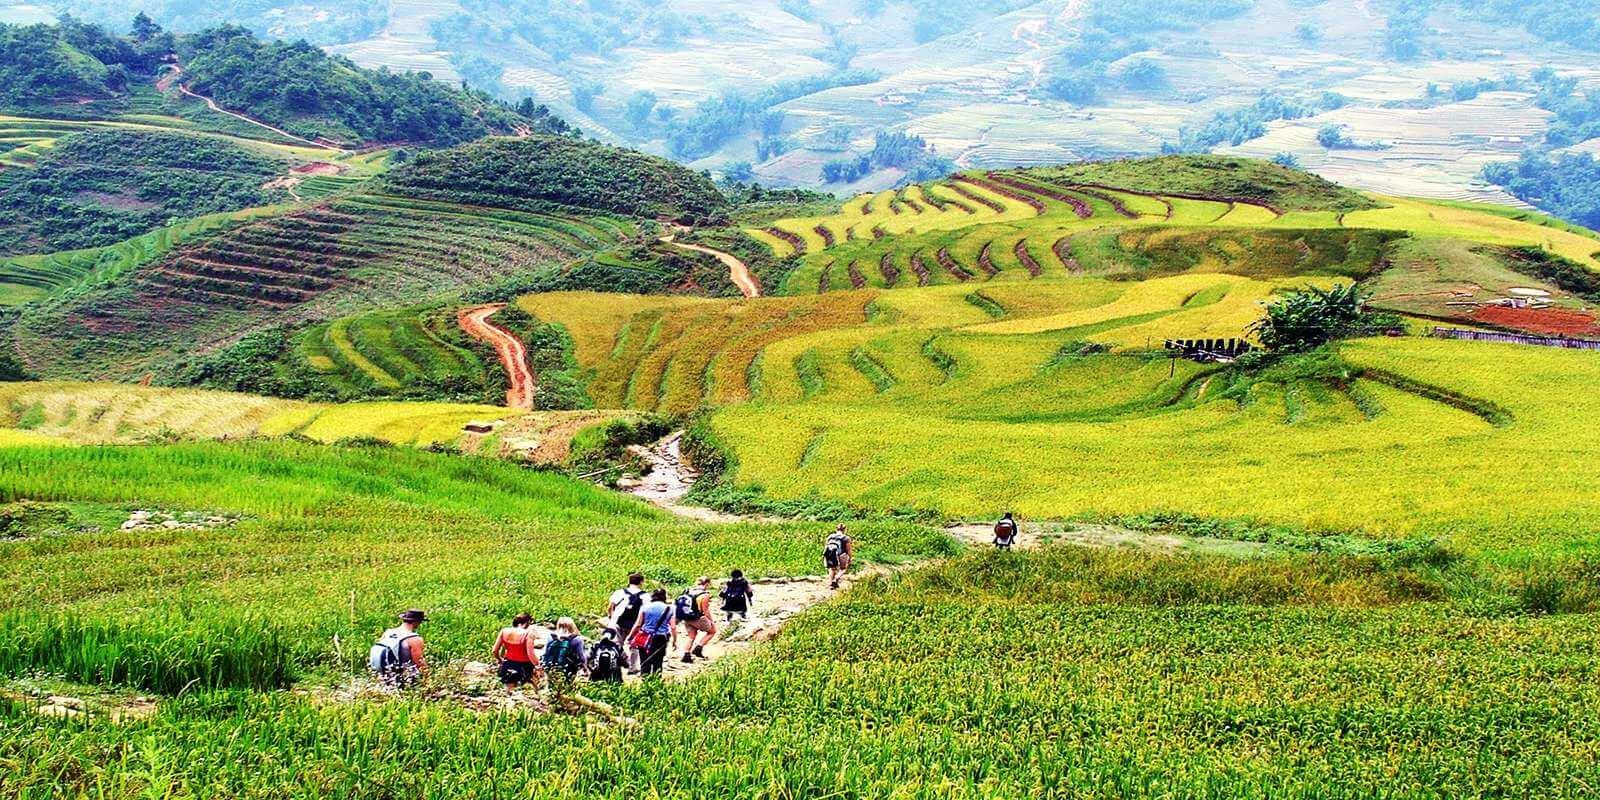 trekking-au-vietnam-4-jours-a-cao-bang-1